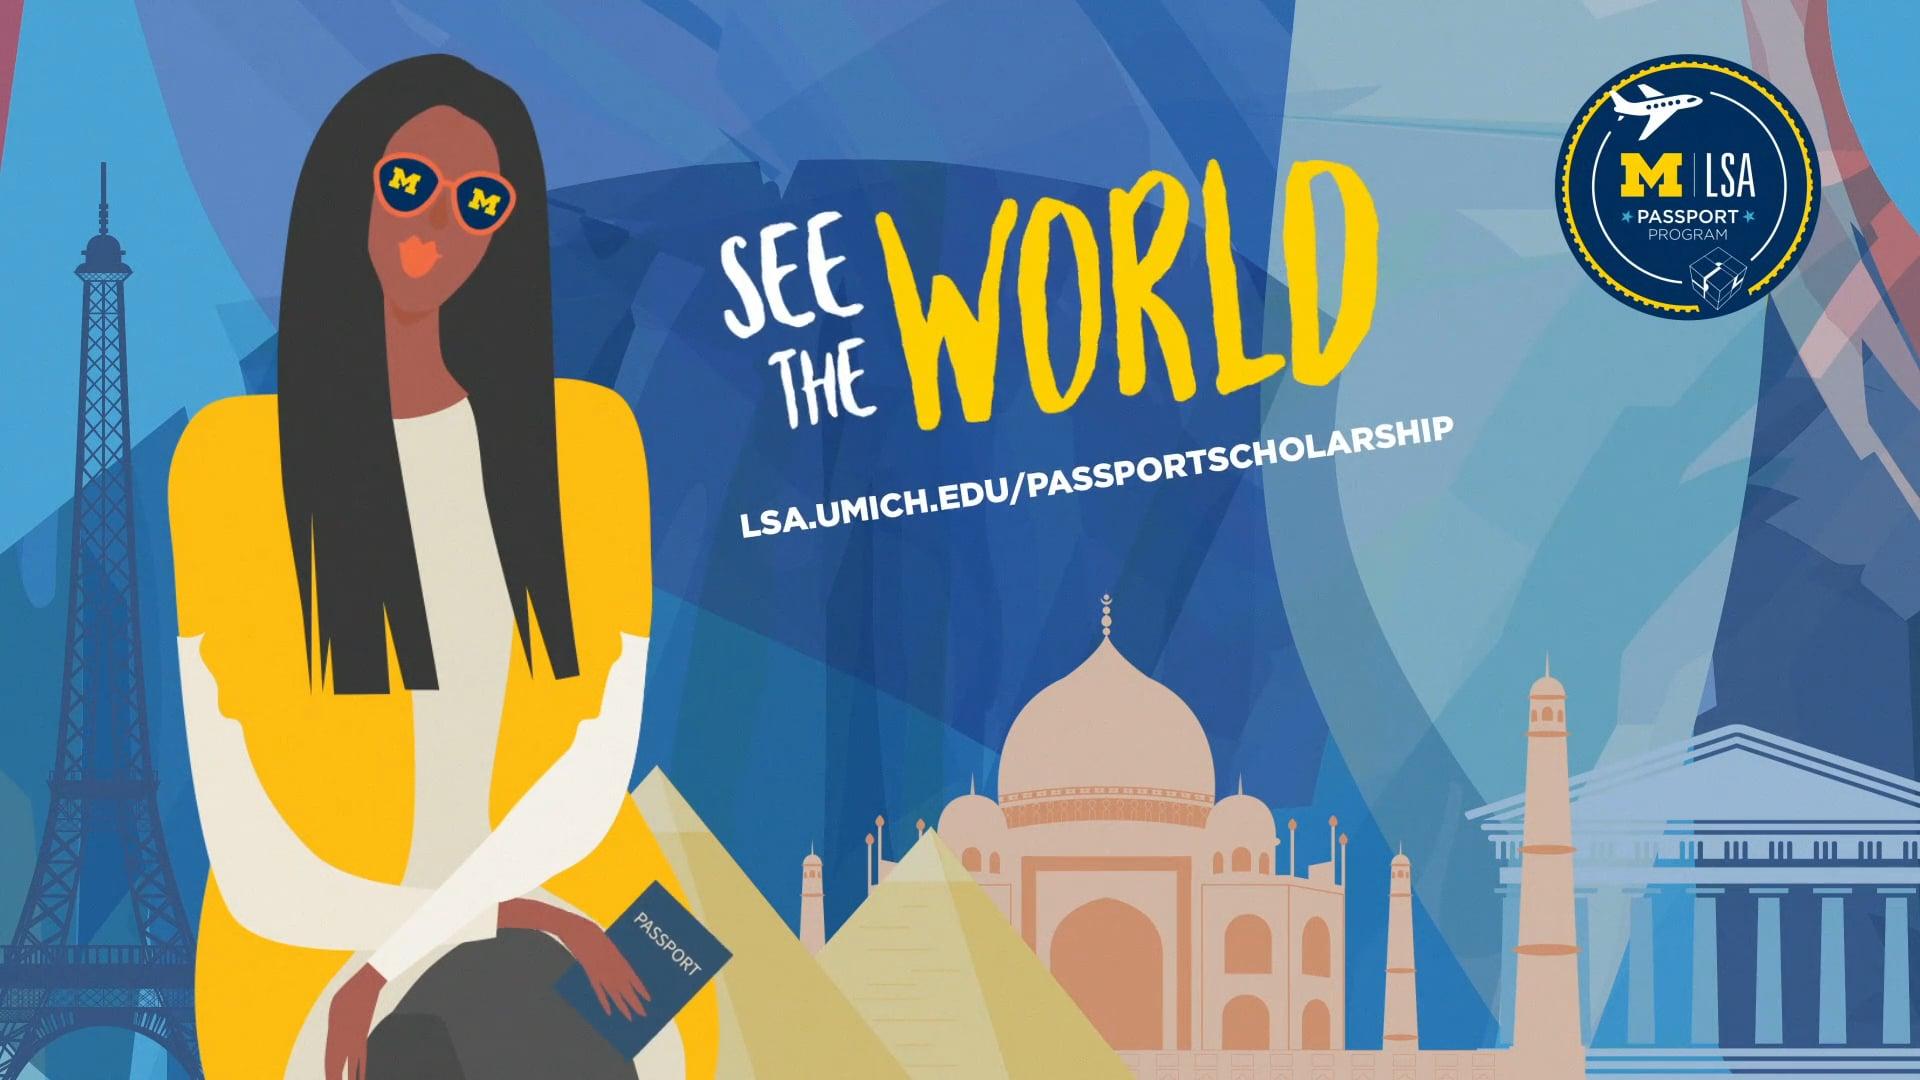 U-M LSA   See the World!